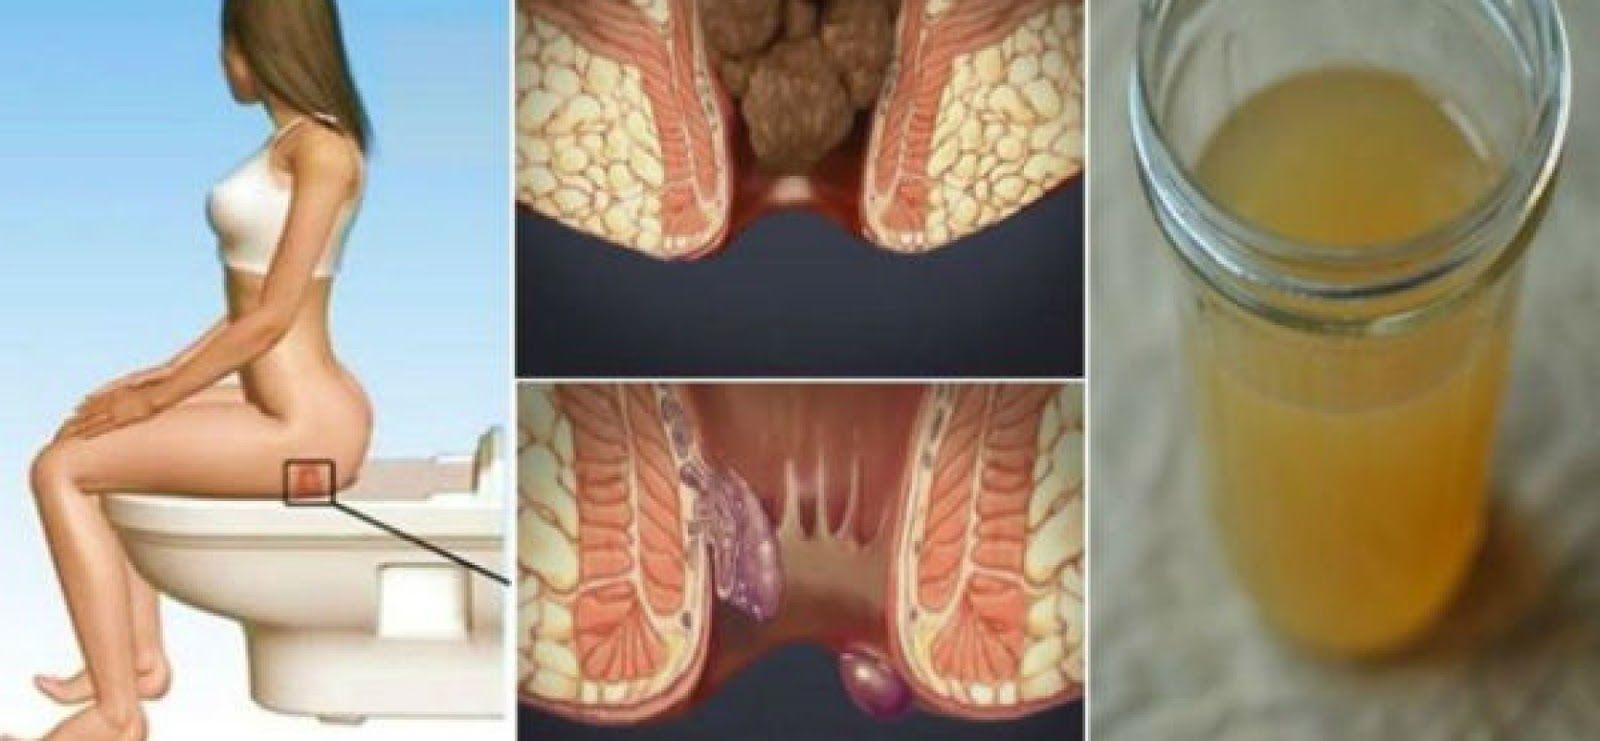 Remedios naturales para combatir las hemorroides